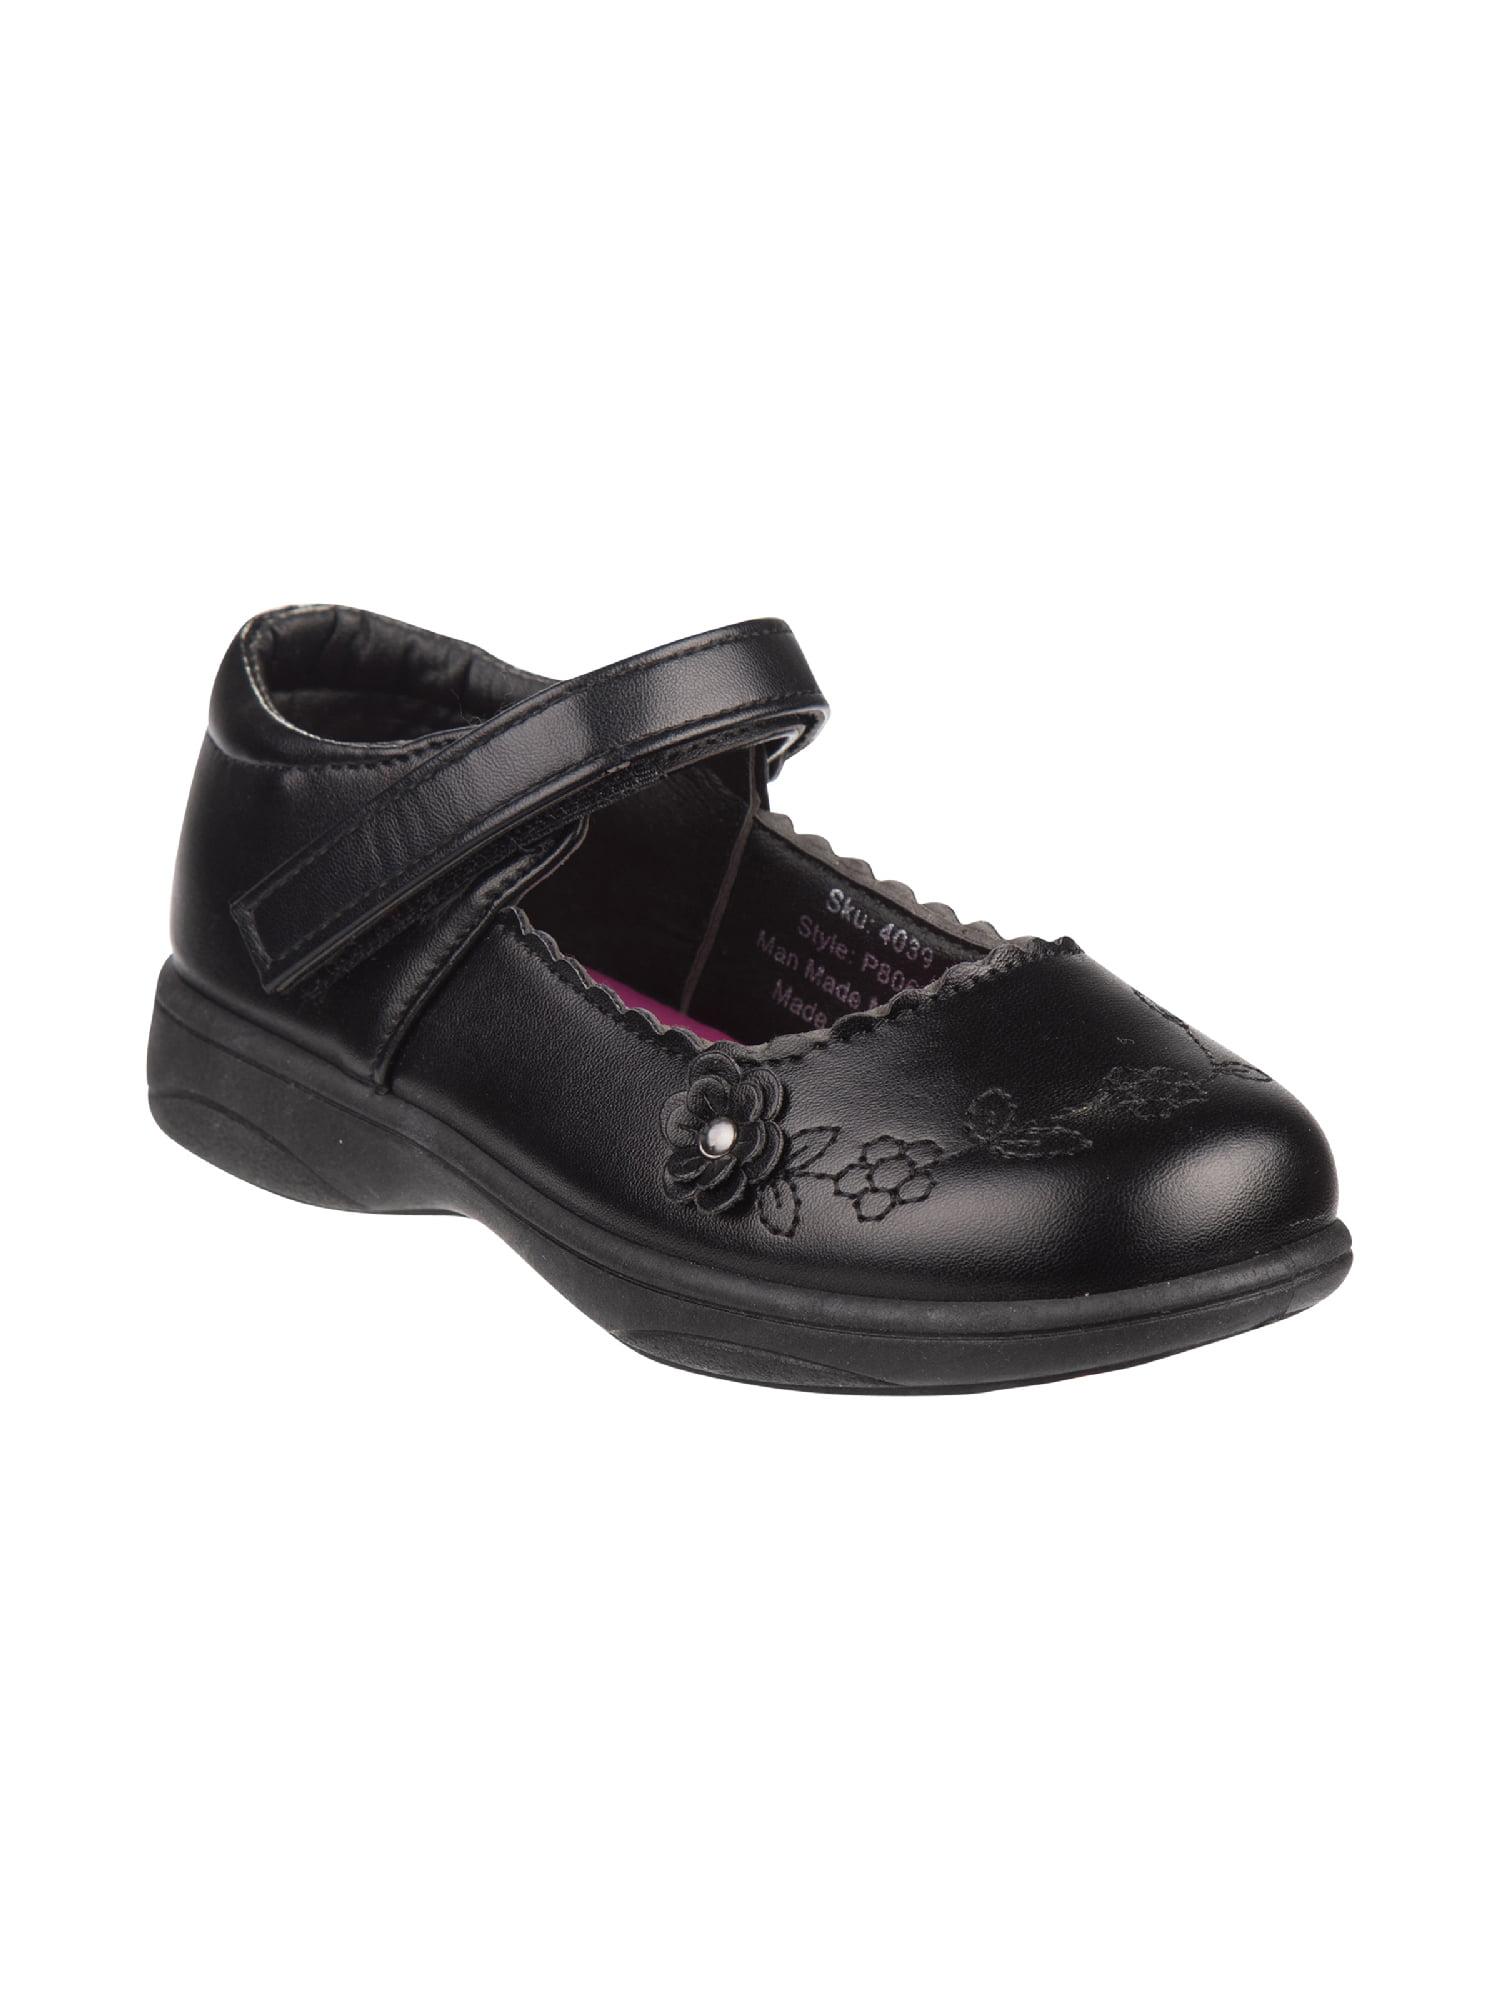 Girls' School Shoes - Walmart.com